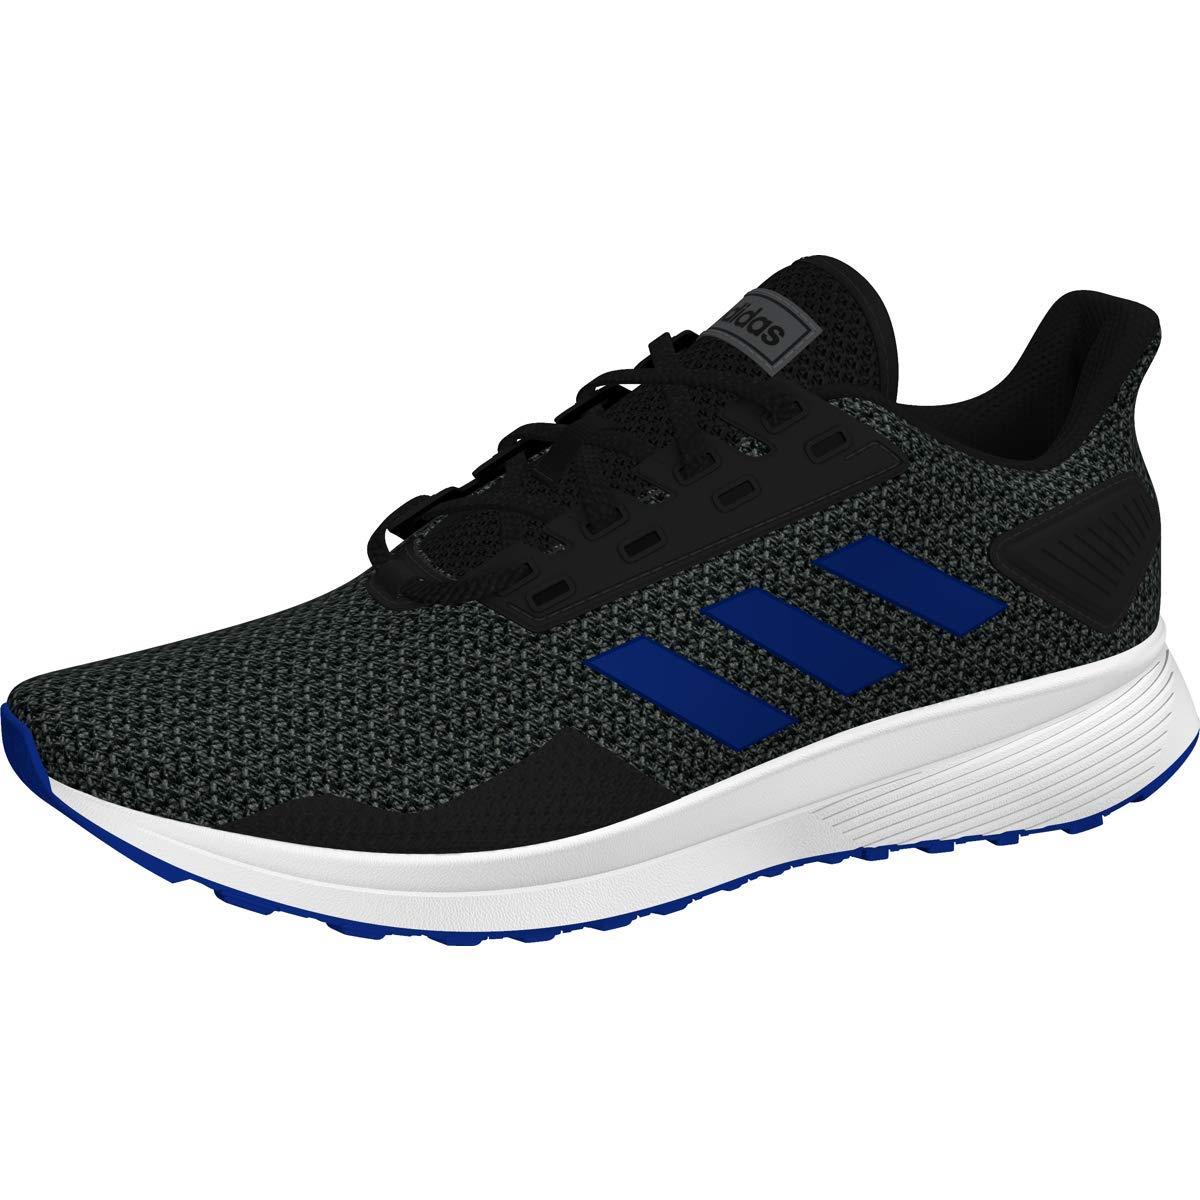 Core Black-royal-grey adidas Men's Duramo 9 Running shoes